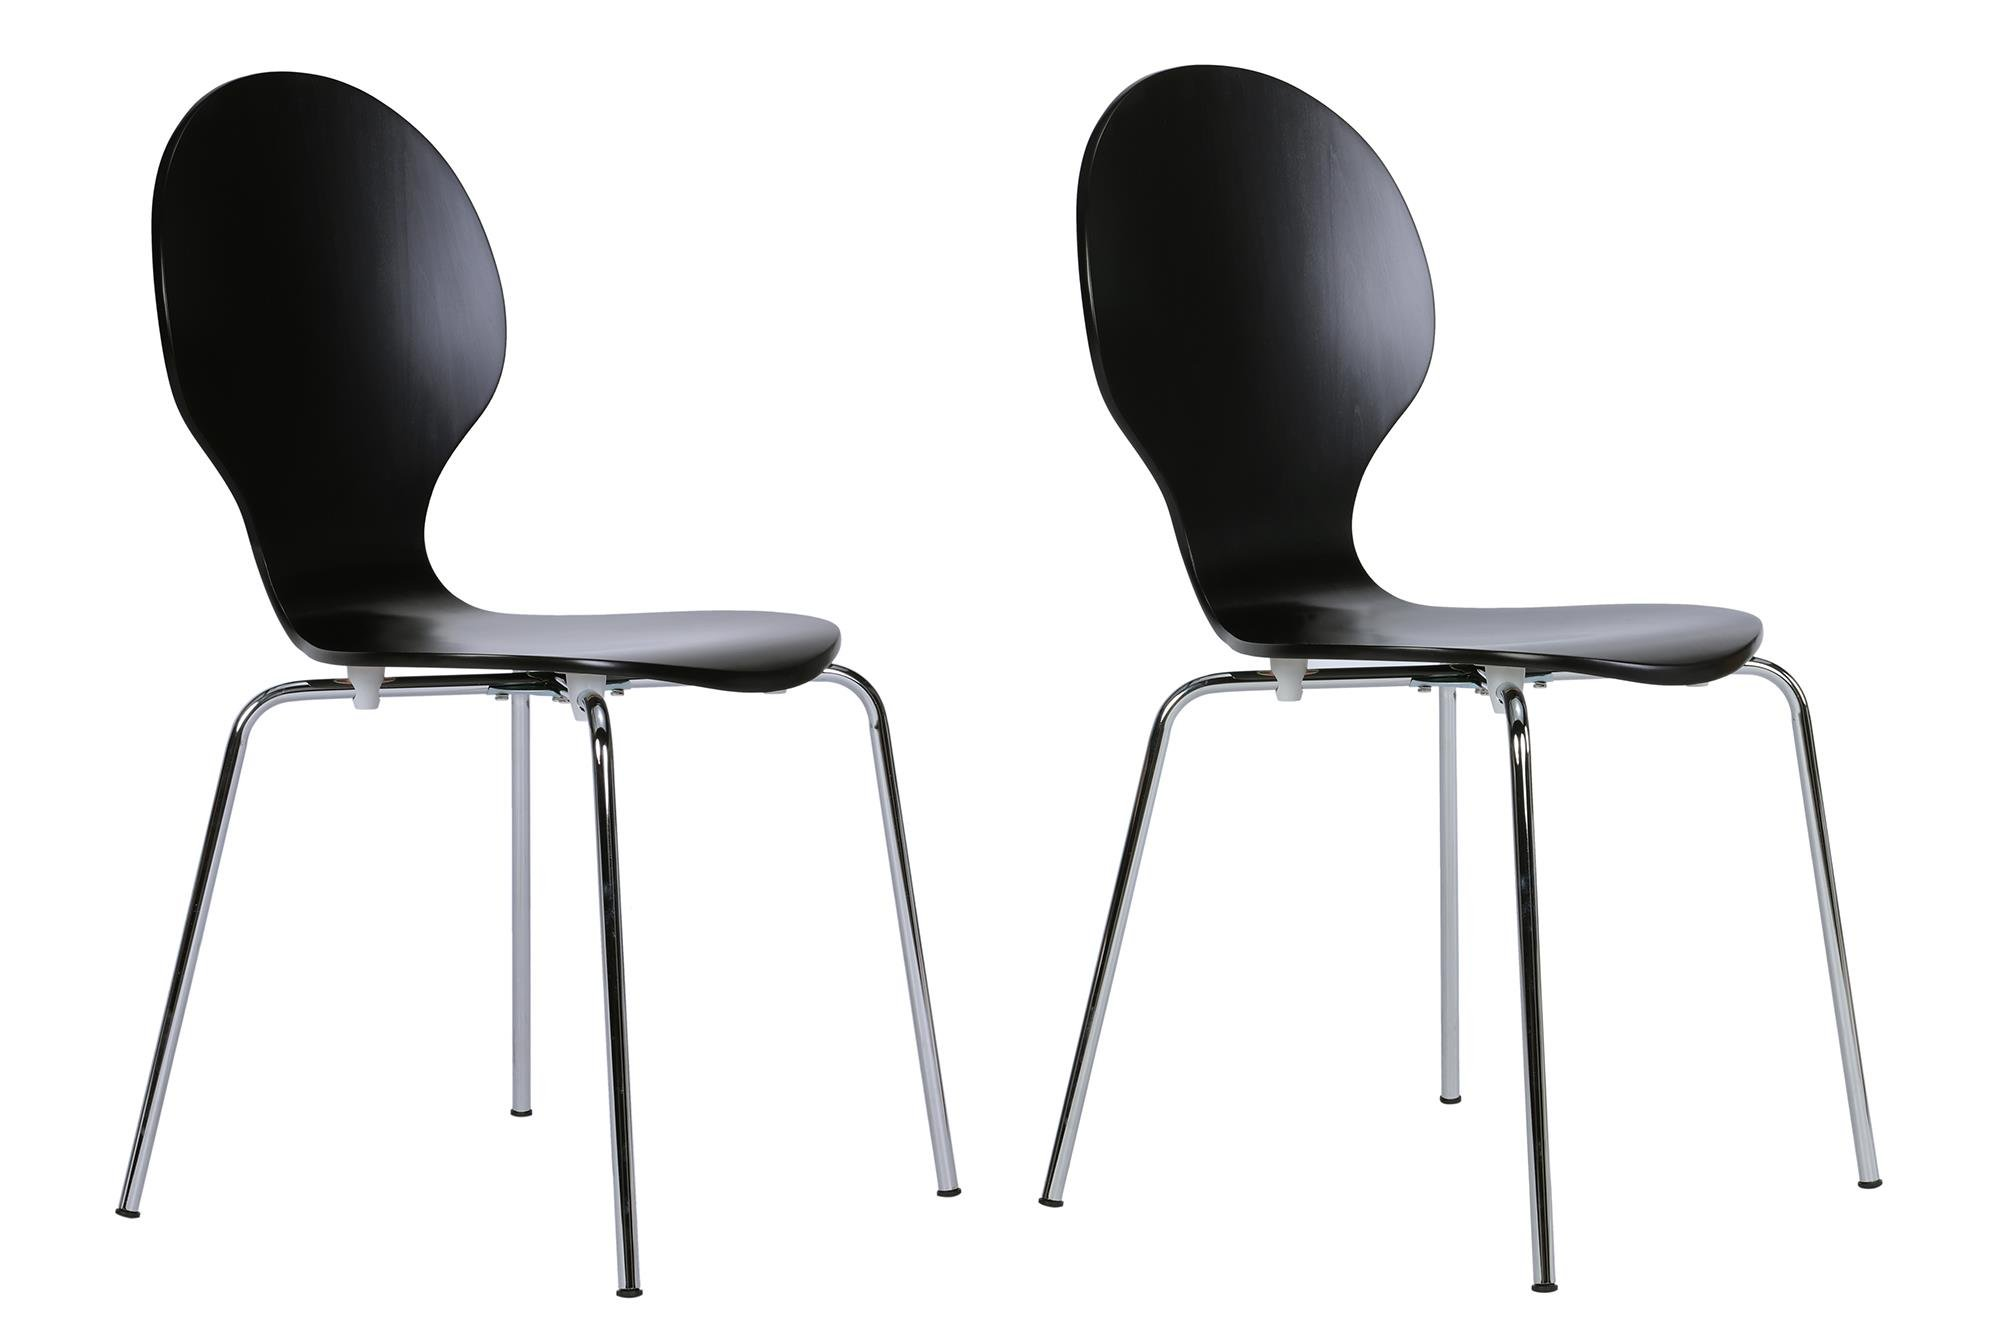 Novogratz Shell Bentwood Modern Round Chairs, Black, Set of 2